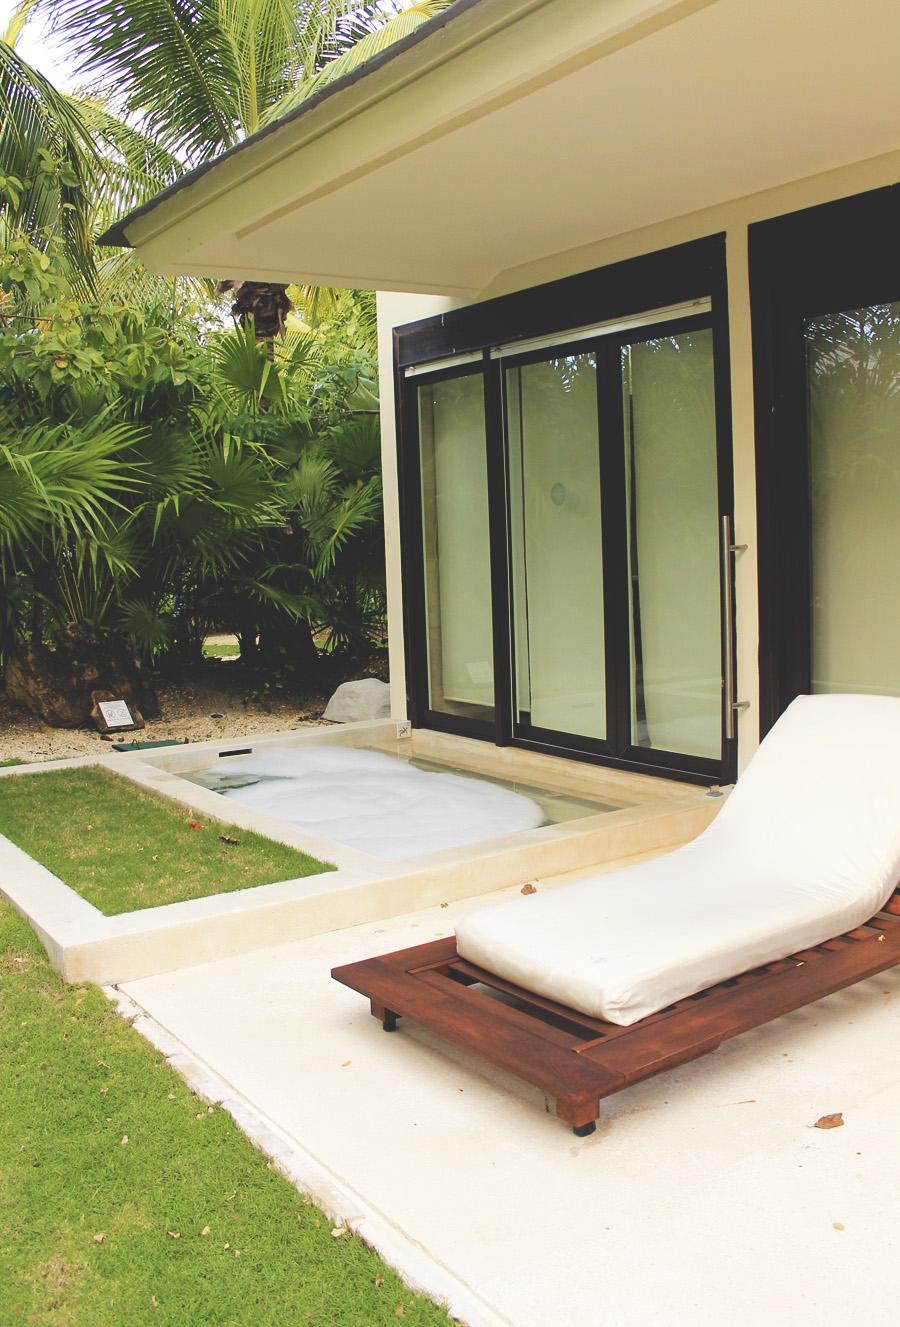 plunge pool villa mexico playa del carmen palm trees